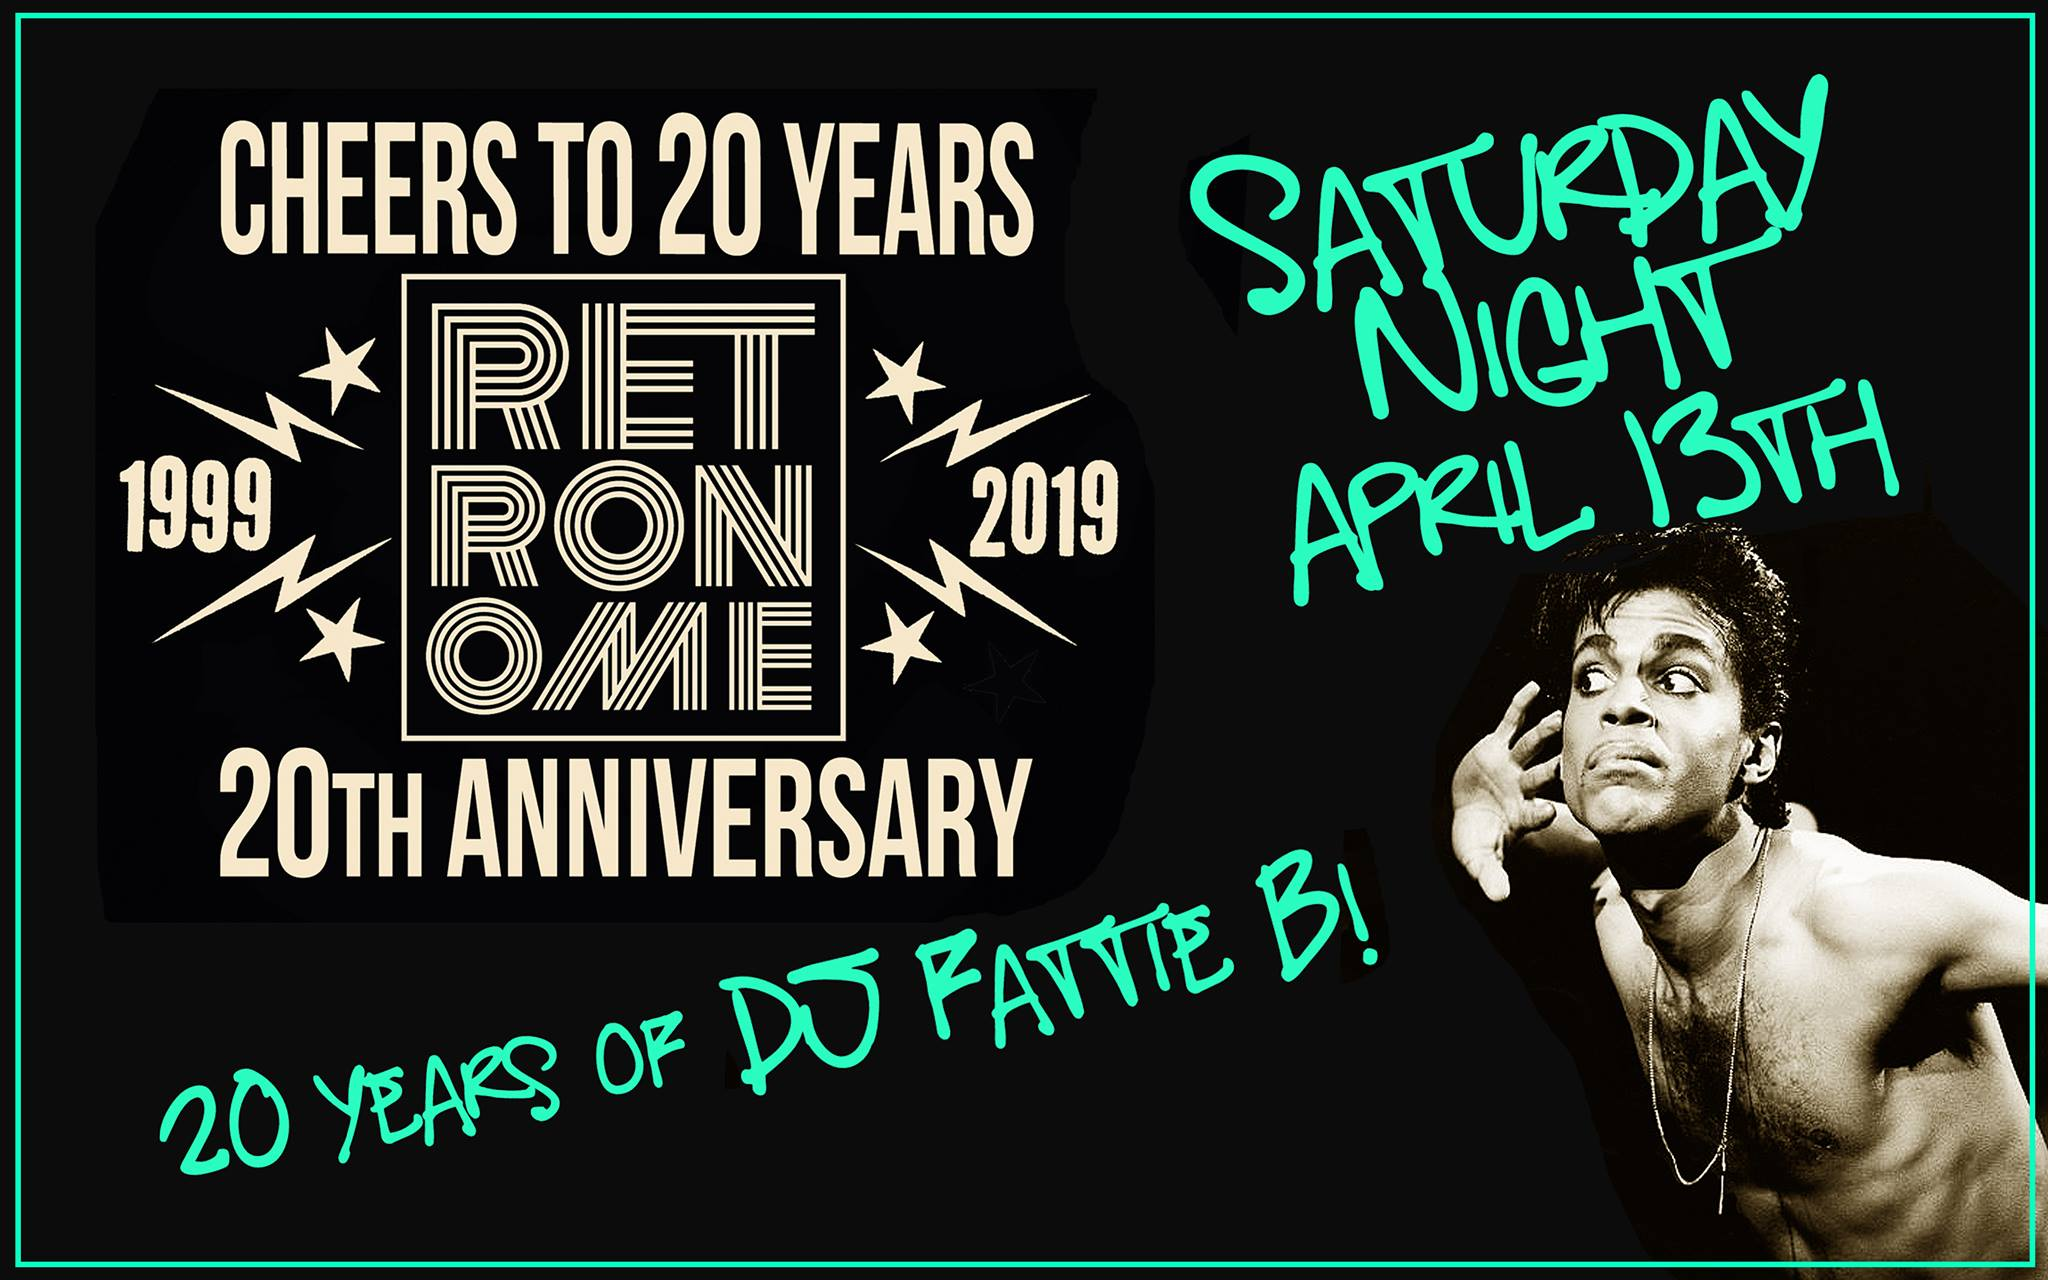 churchstreetdjs-retronome-club-metronome-20-year-anniversary.jpg